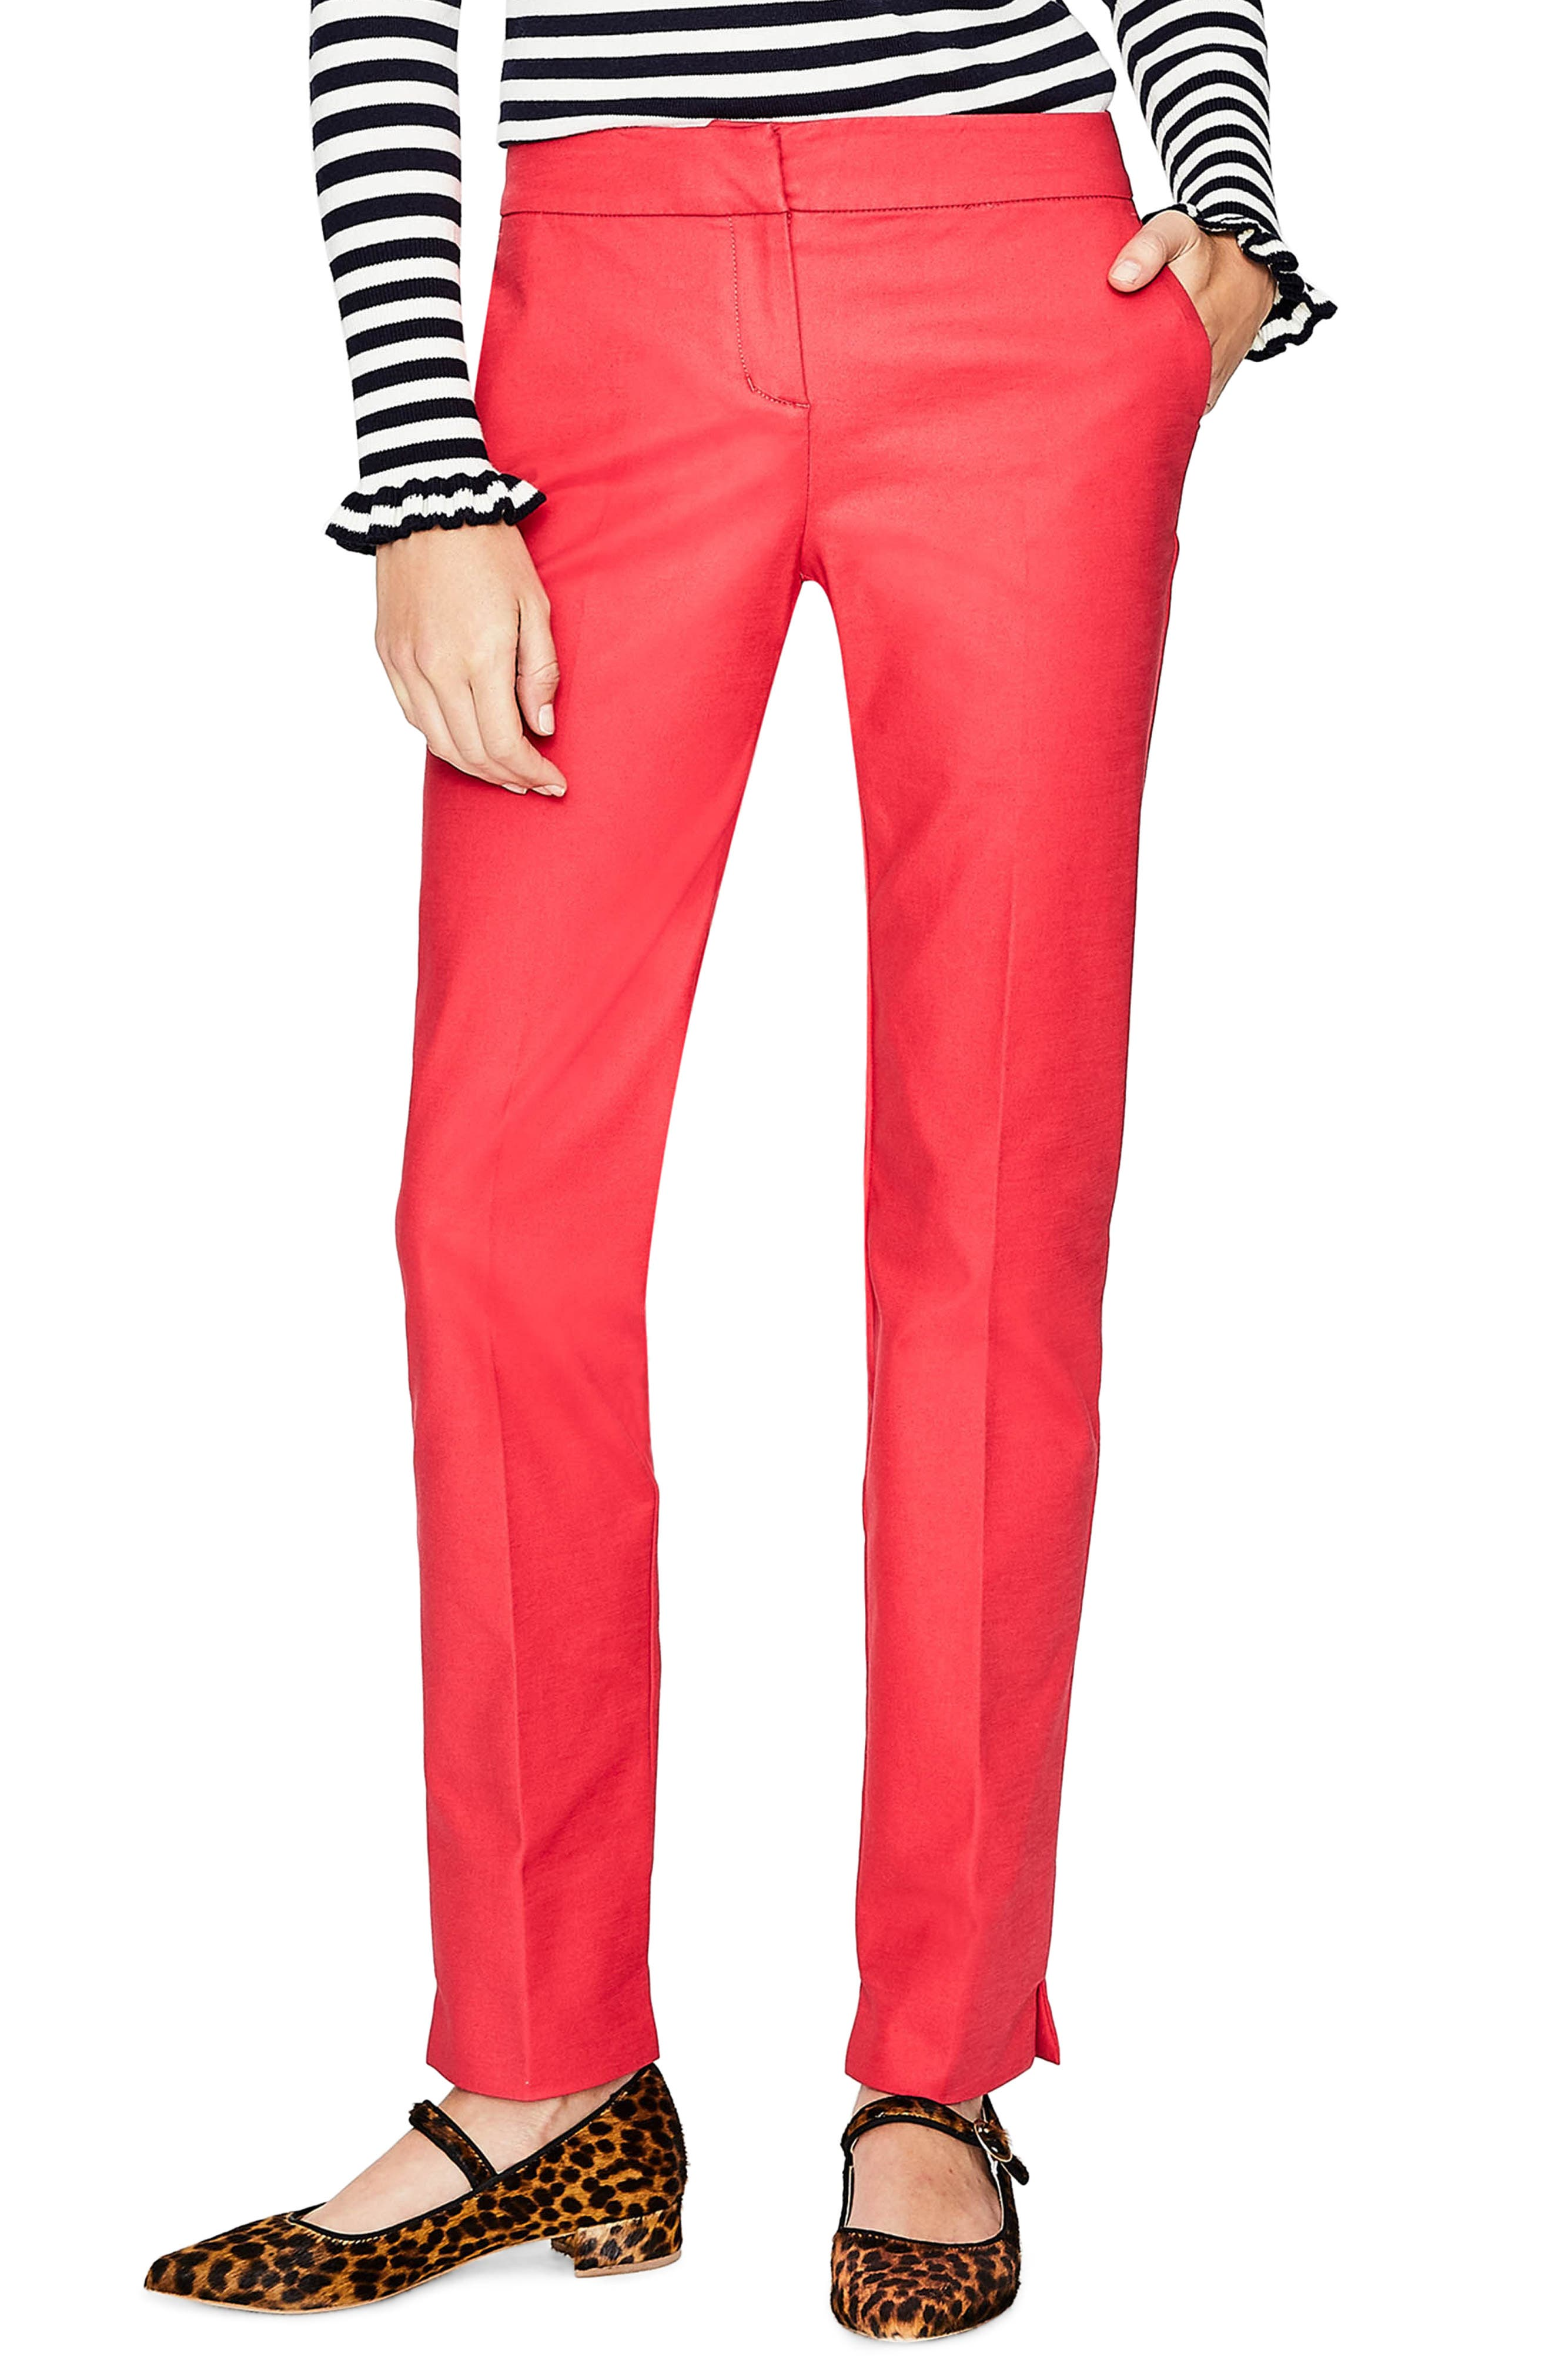 Boden Richmond Stretch Cotton Trousers